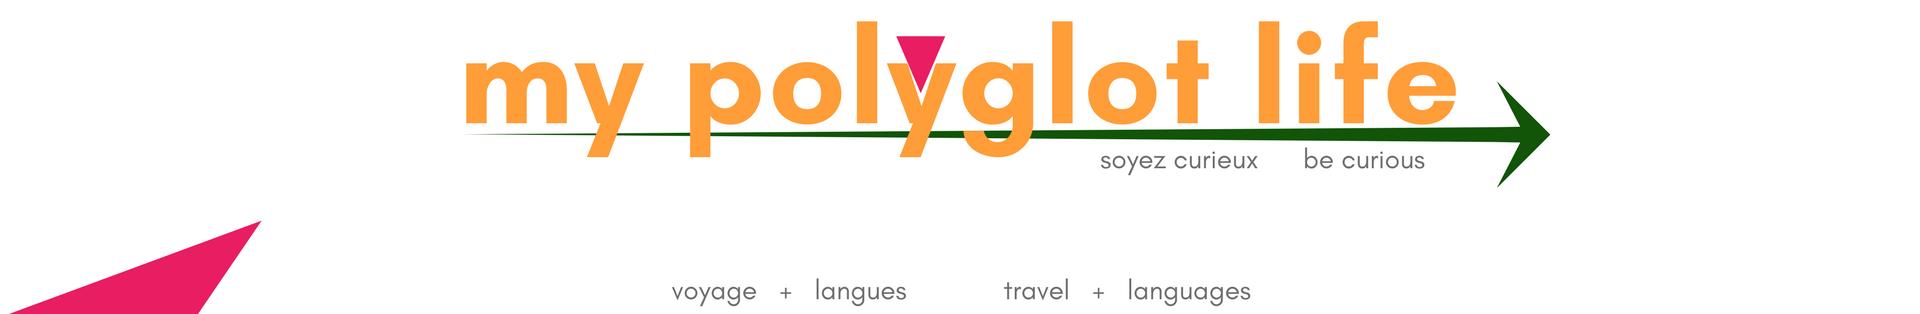 my polyglot life